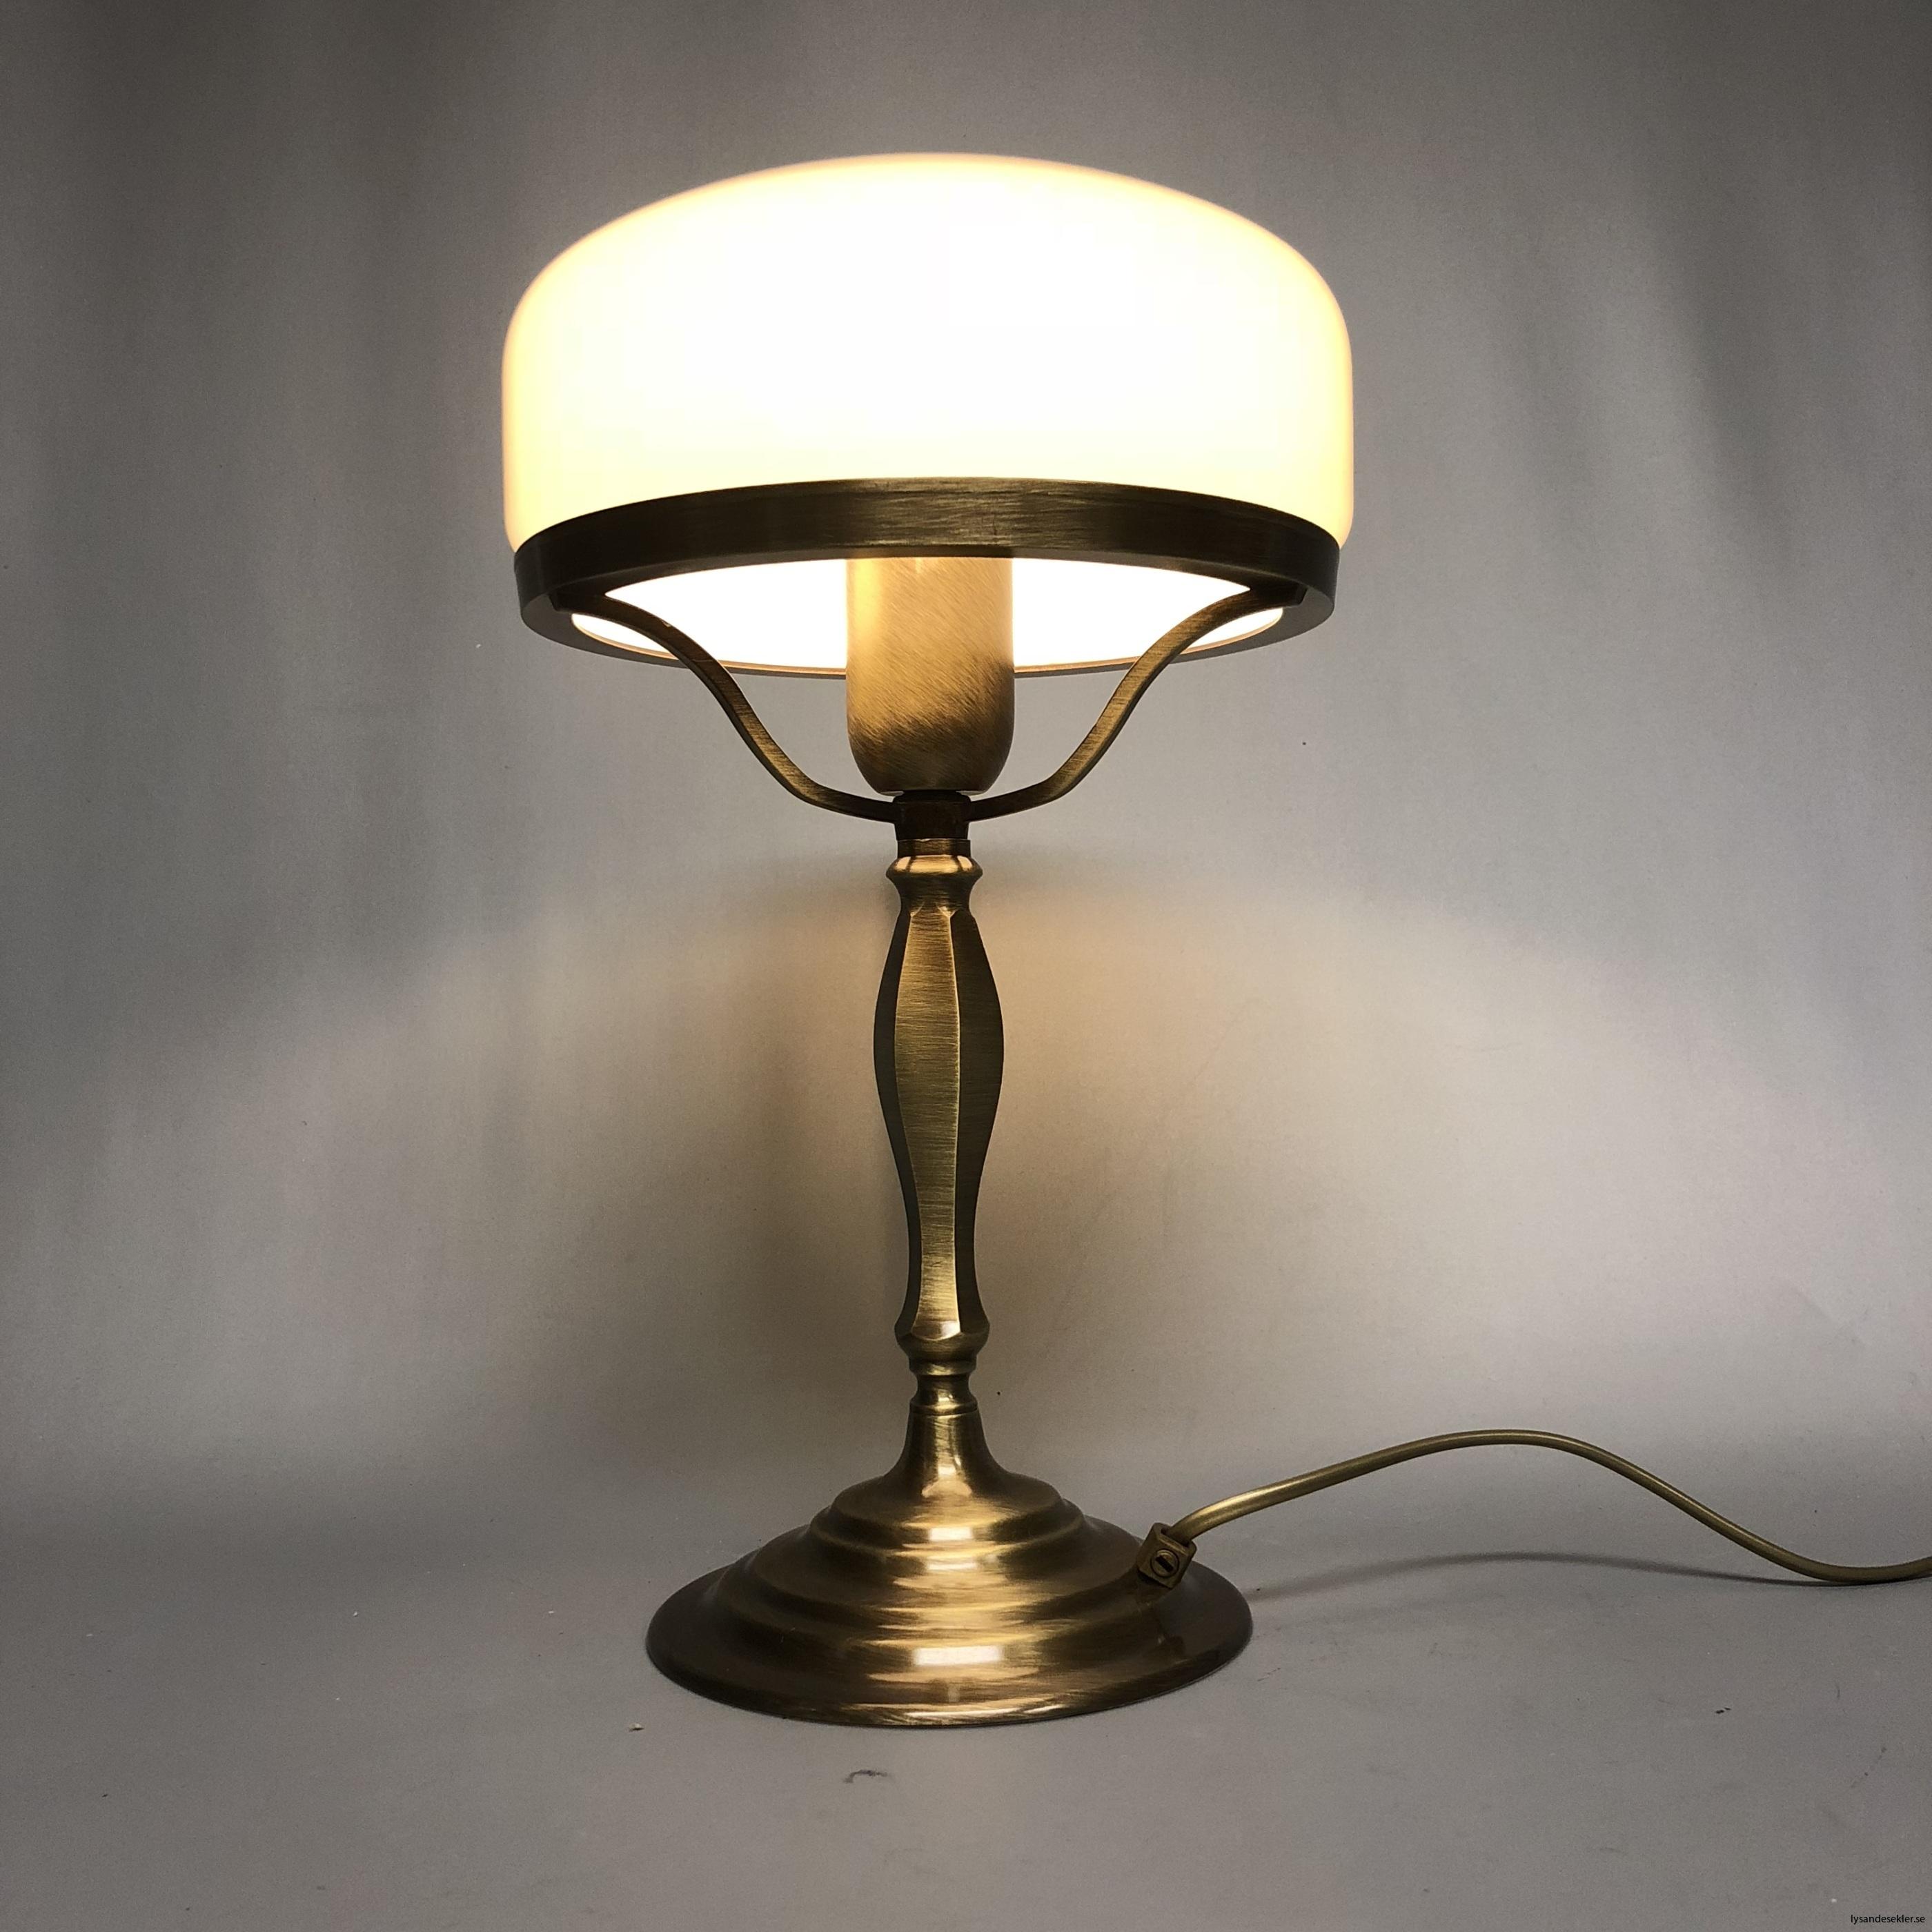 strindbergslampa strindbergslampor strindberg lampa skärm kupa strindbergsskärm strindbergskupa48